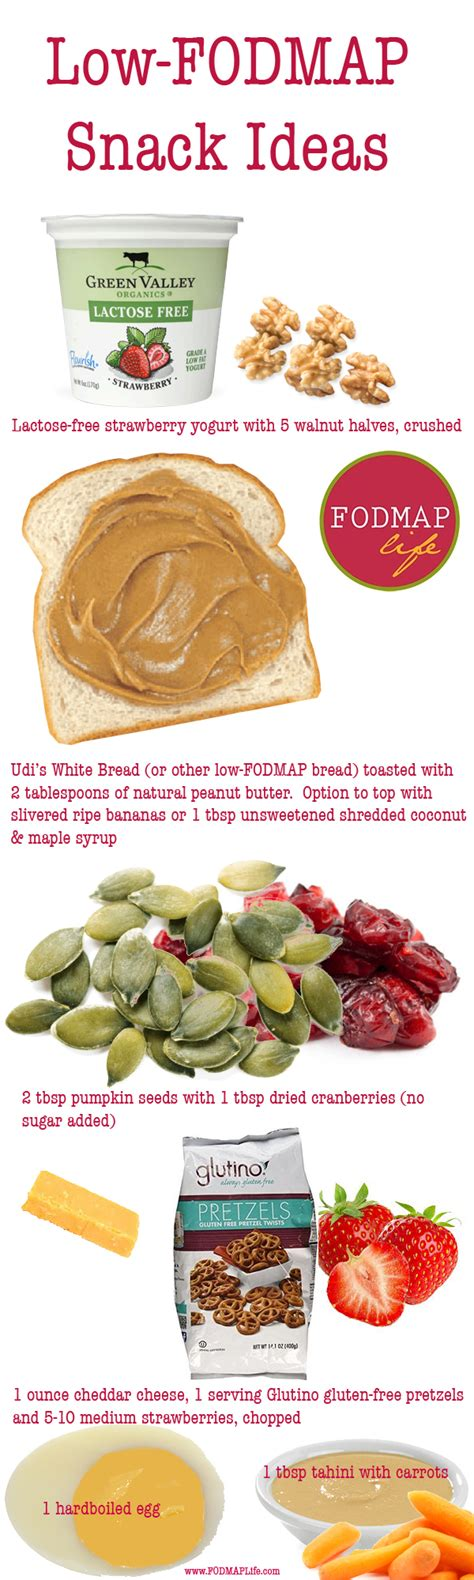 fruit 30 minutes before meal 45 low fodmap snack ideas fodmap